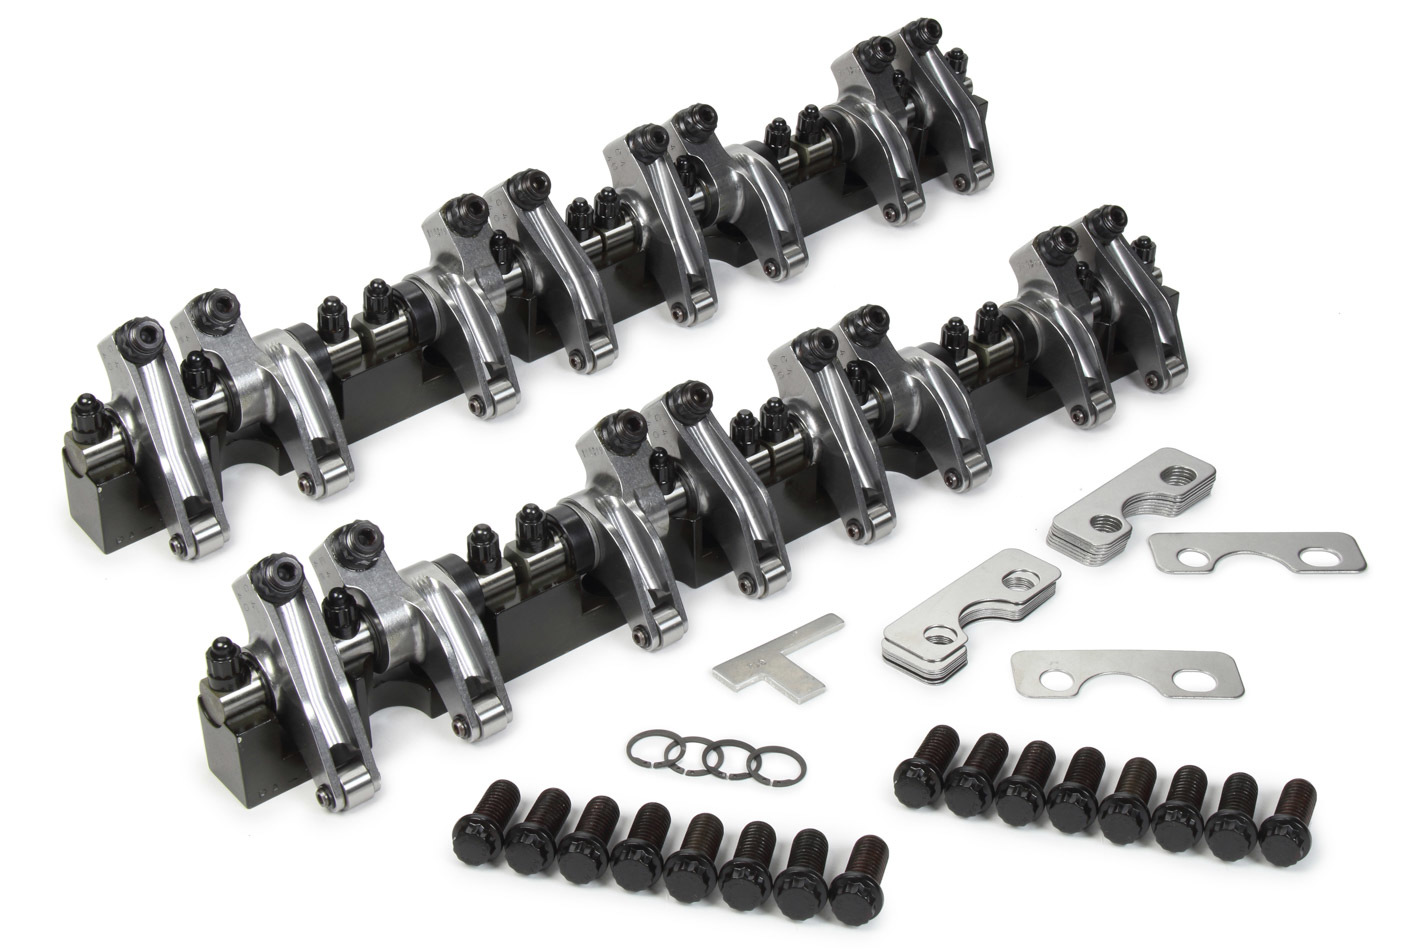 T&D Machine 2126S-165PLUS100/155 Rocker Arm, Shaft Mount, 1.65 Ratio, Full Roller, Aluminum, Natural, Aluminum 13 Degree Dart, Small Block Chevy, Kit